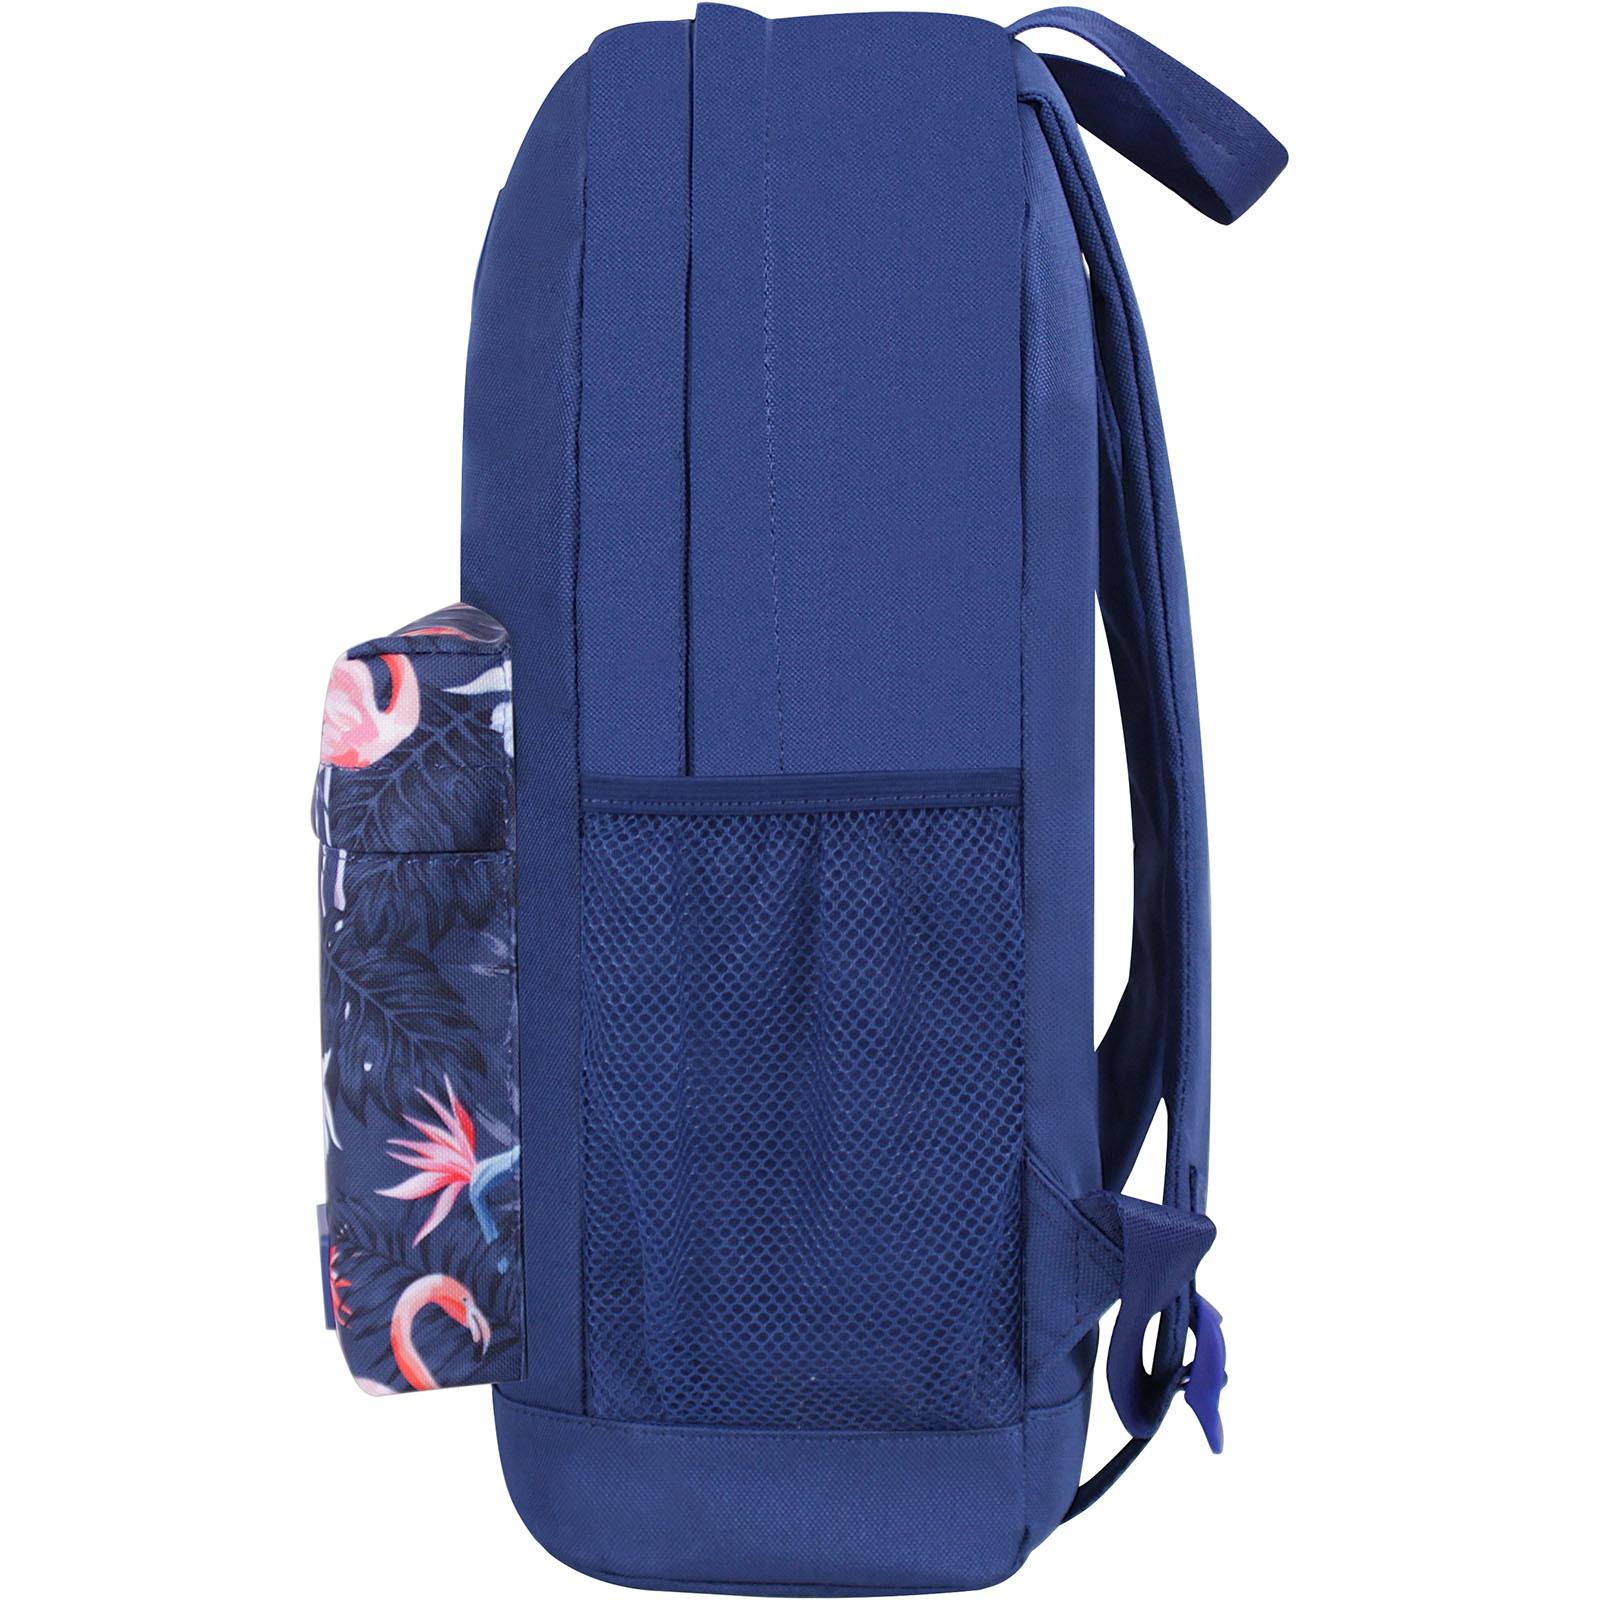 Рюкзак Bagland Молодежный W/R 17 л. Синий 762 (00533662) фото 3